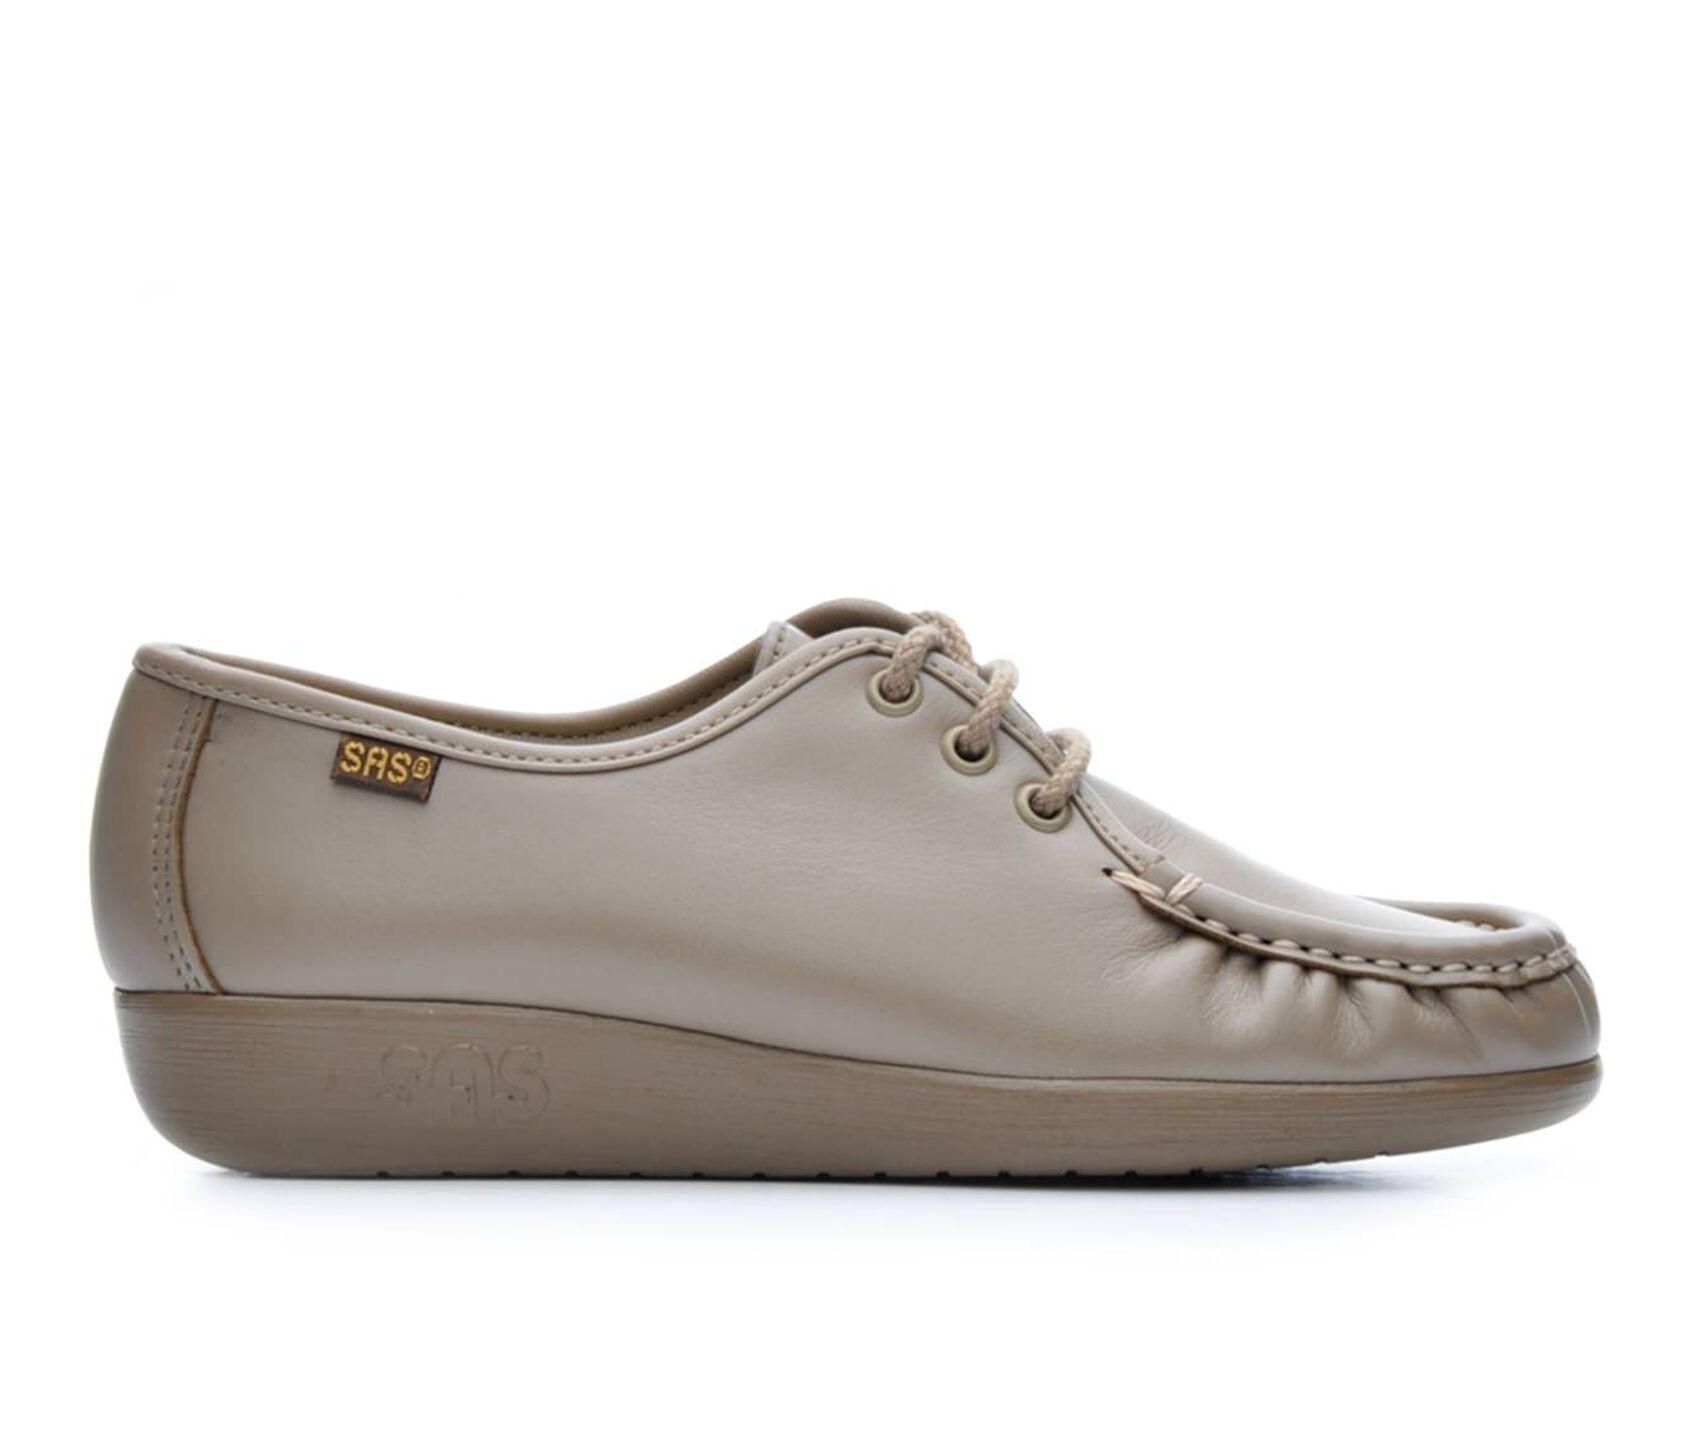 f87d00c54c90 ... Sas Siesta Comfort Tie Comfort Shoes. Previous